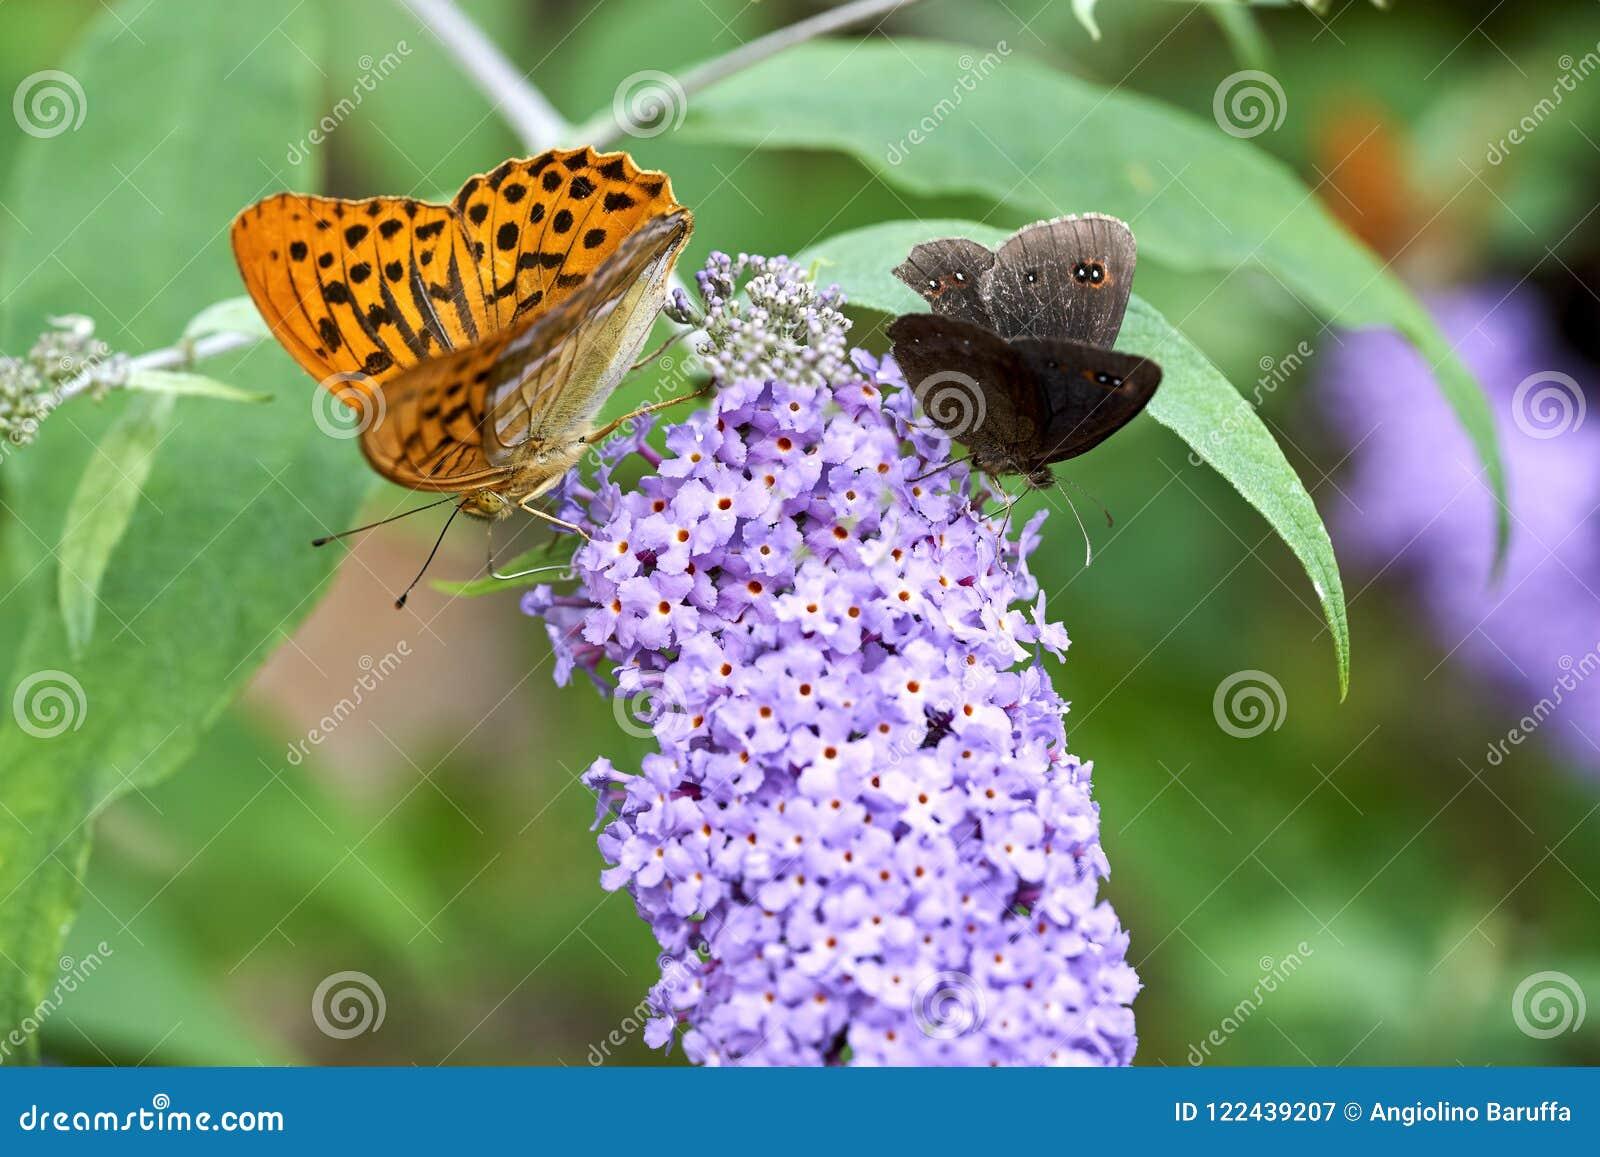 Oranje die aglaja van Argynnis van vlinderaglaia op een bloem zuigende nectar wordt gesteld